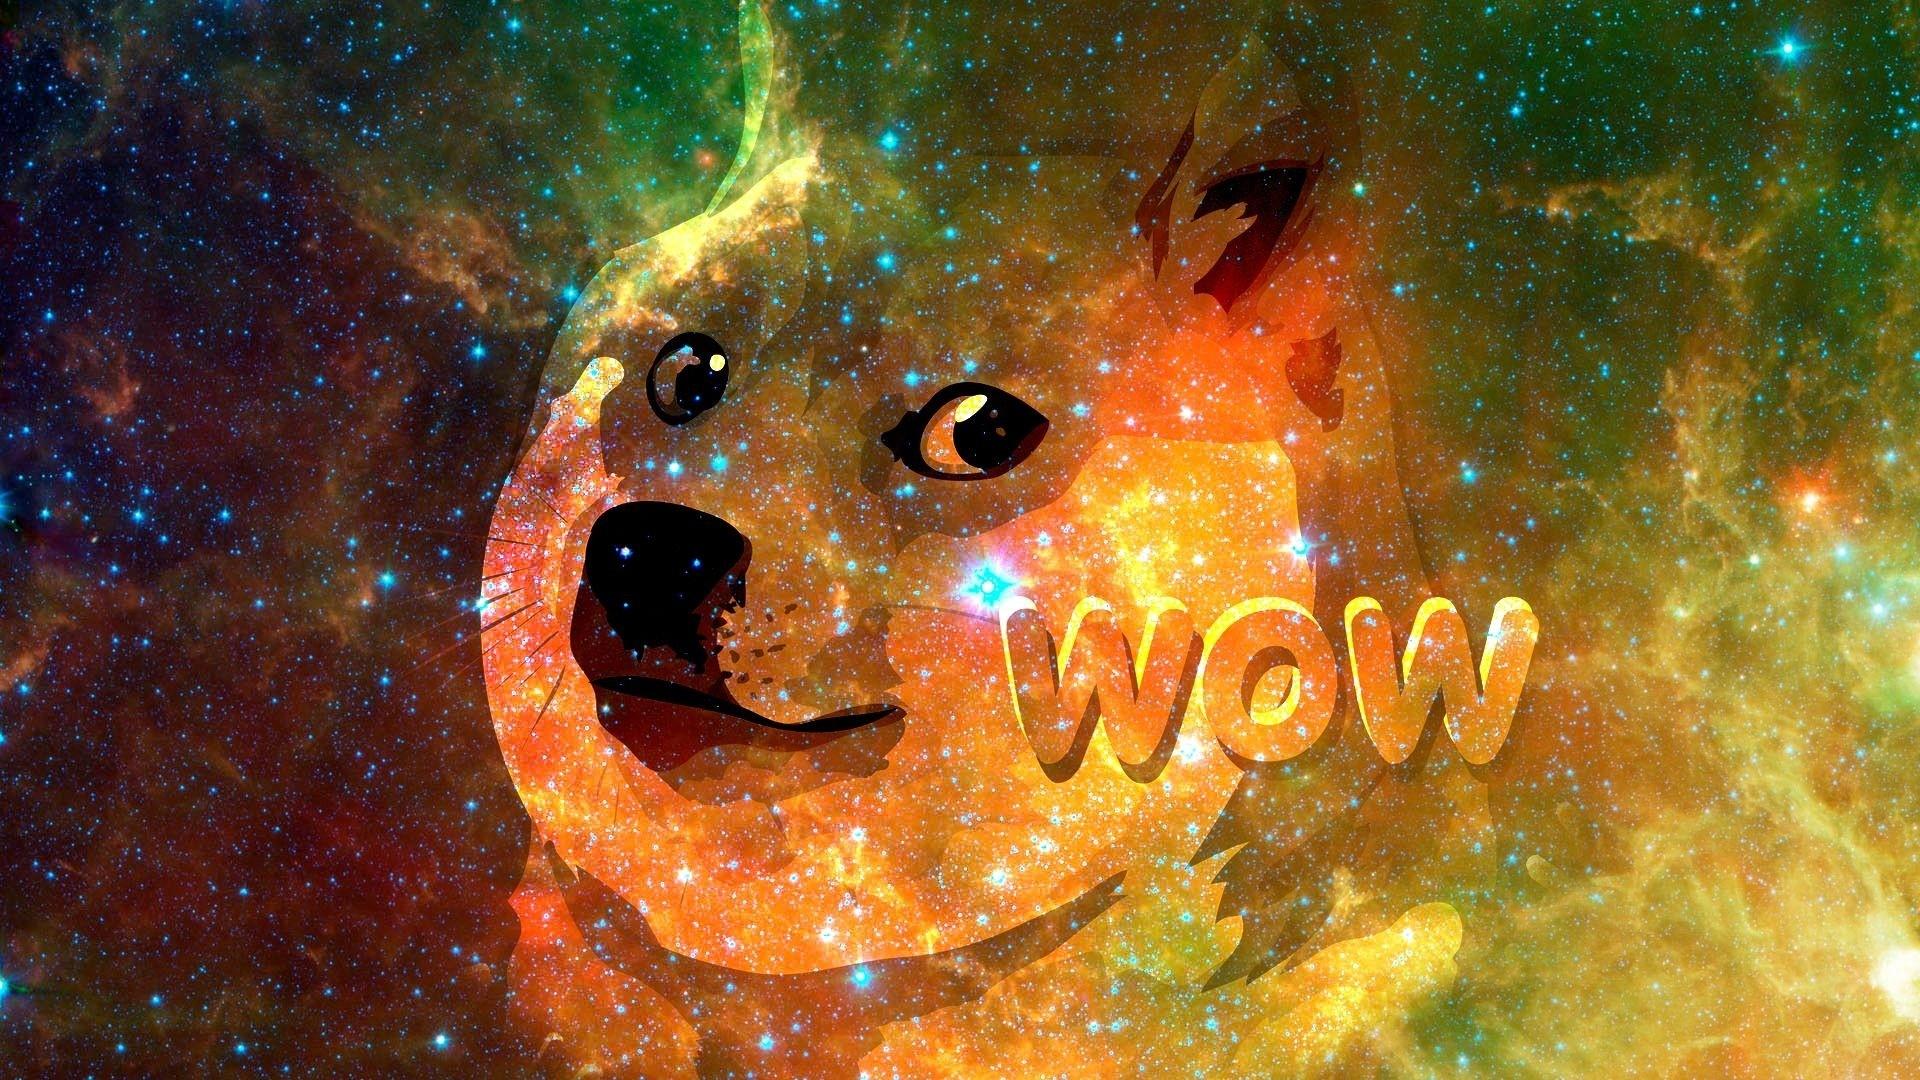 Doge Meme desktop wallpaper free download